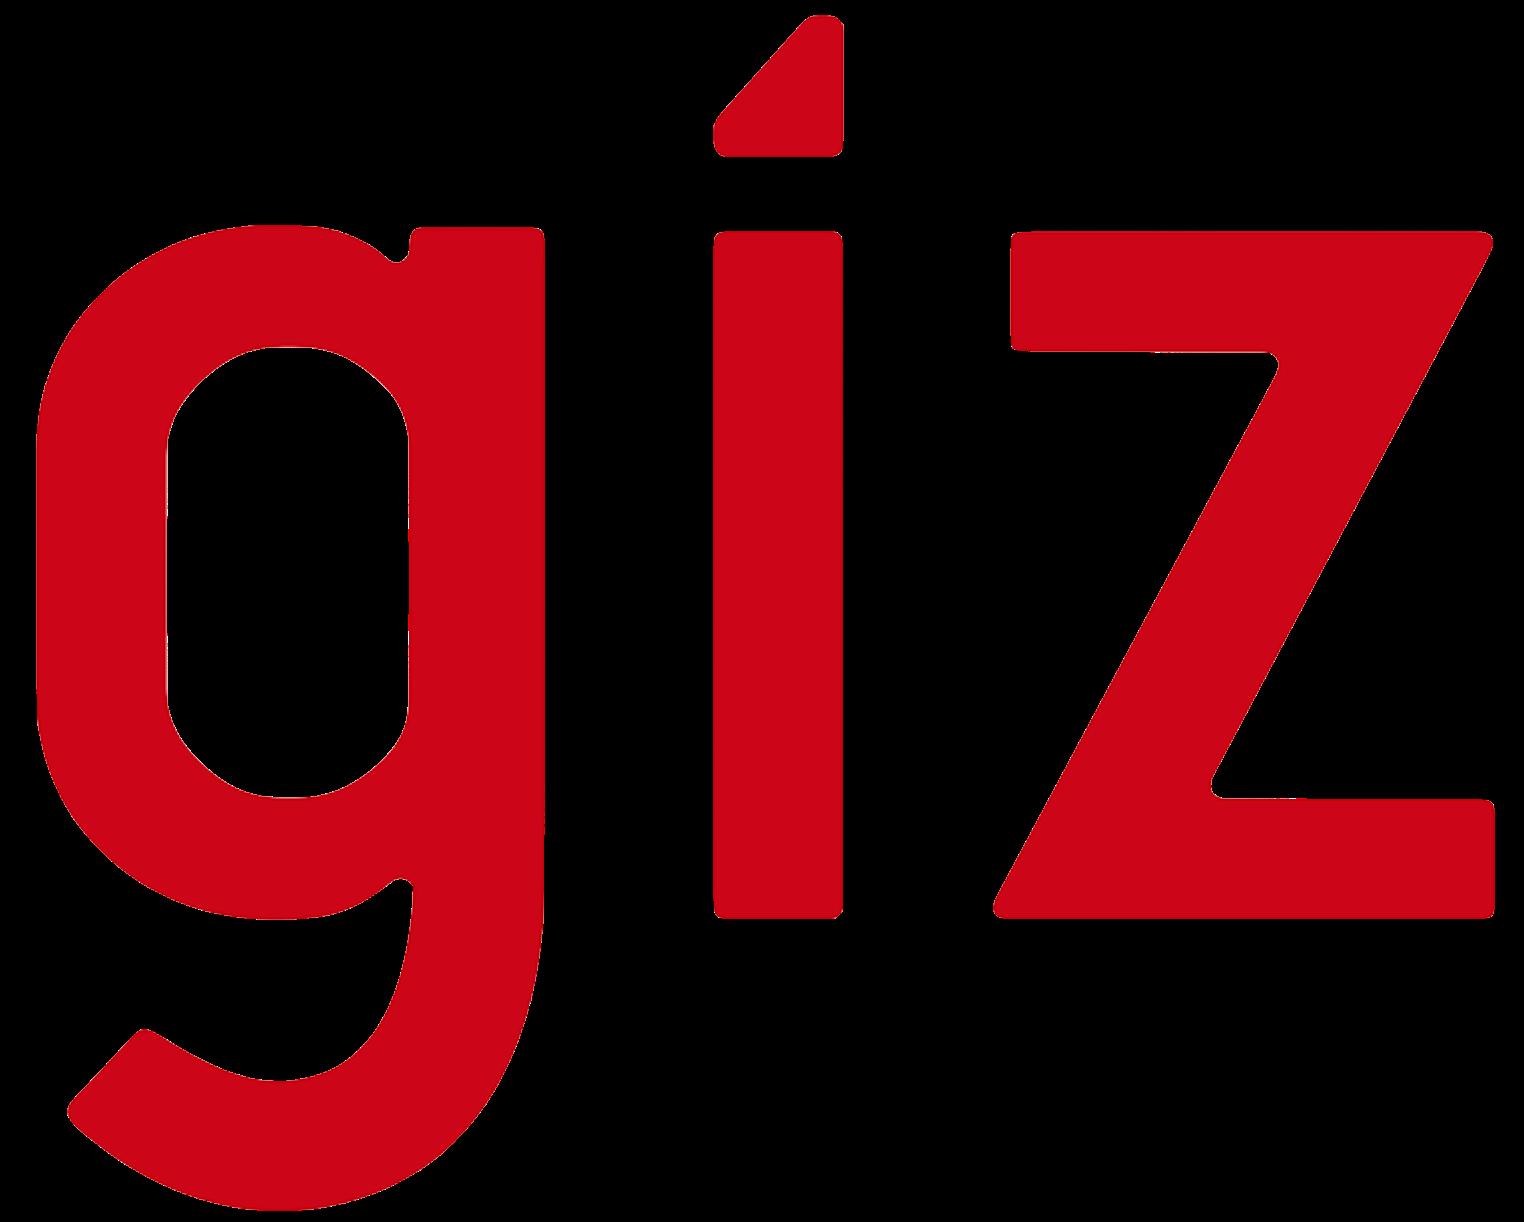 GIZ Vacancy - Technical Project Professional (Advisor) for INDCs, Jakarta